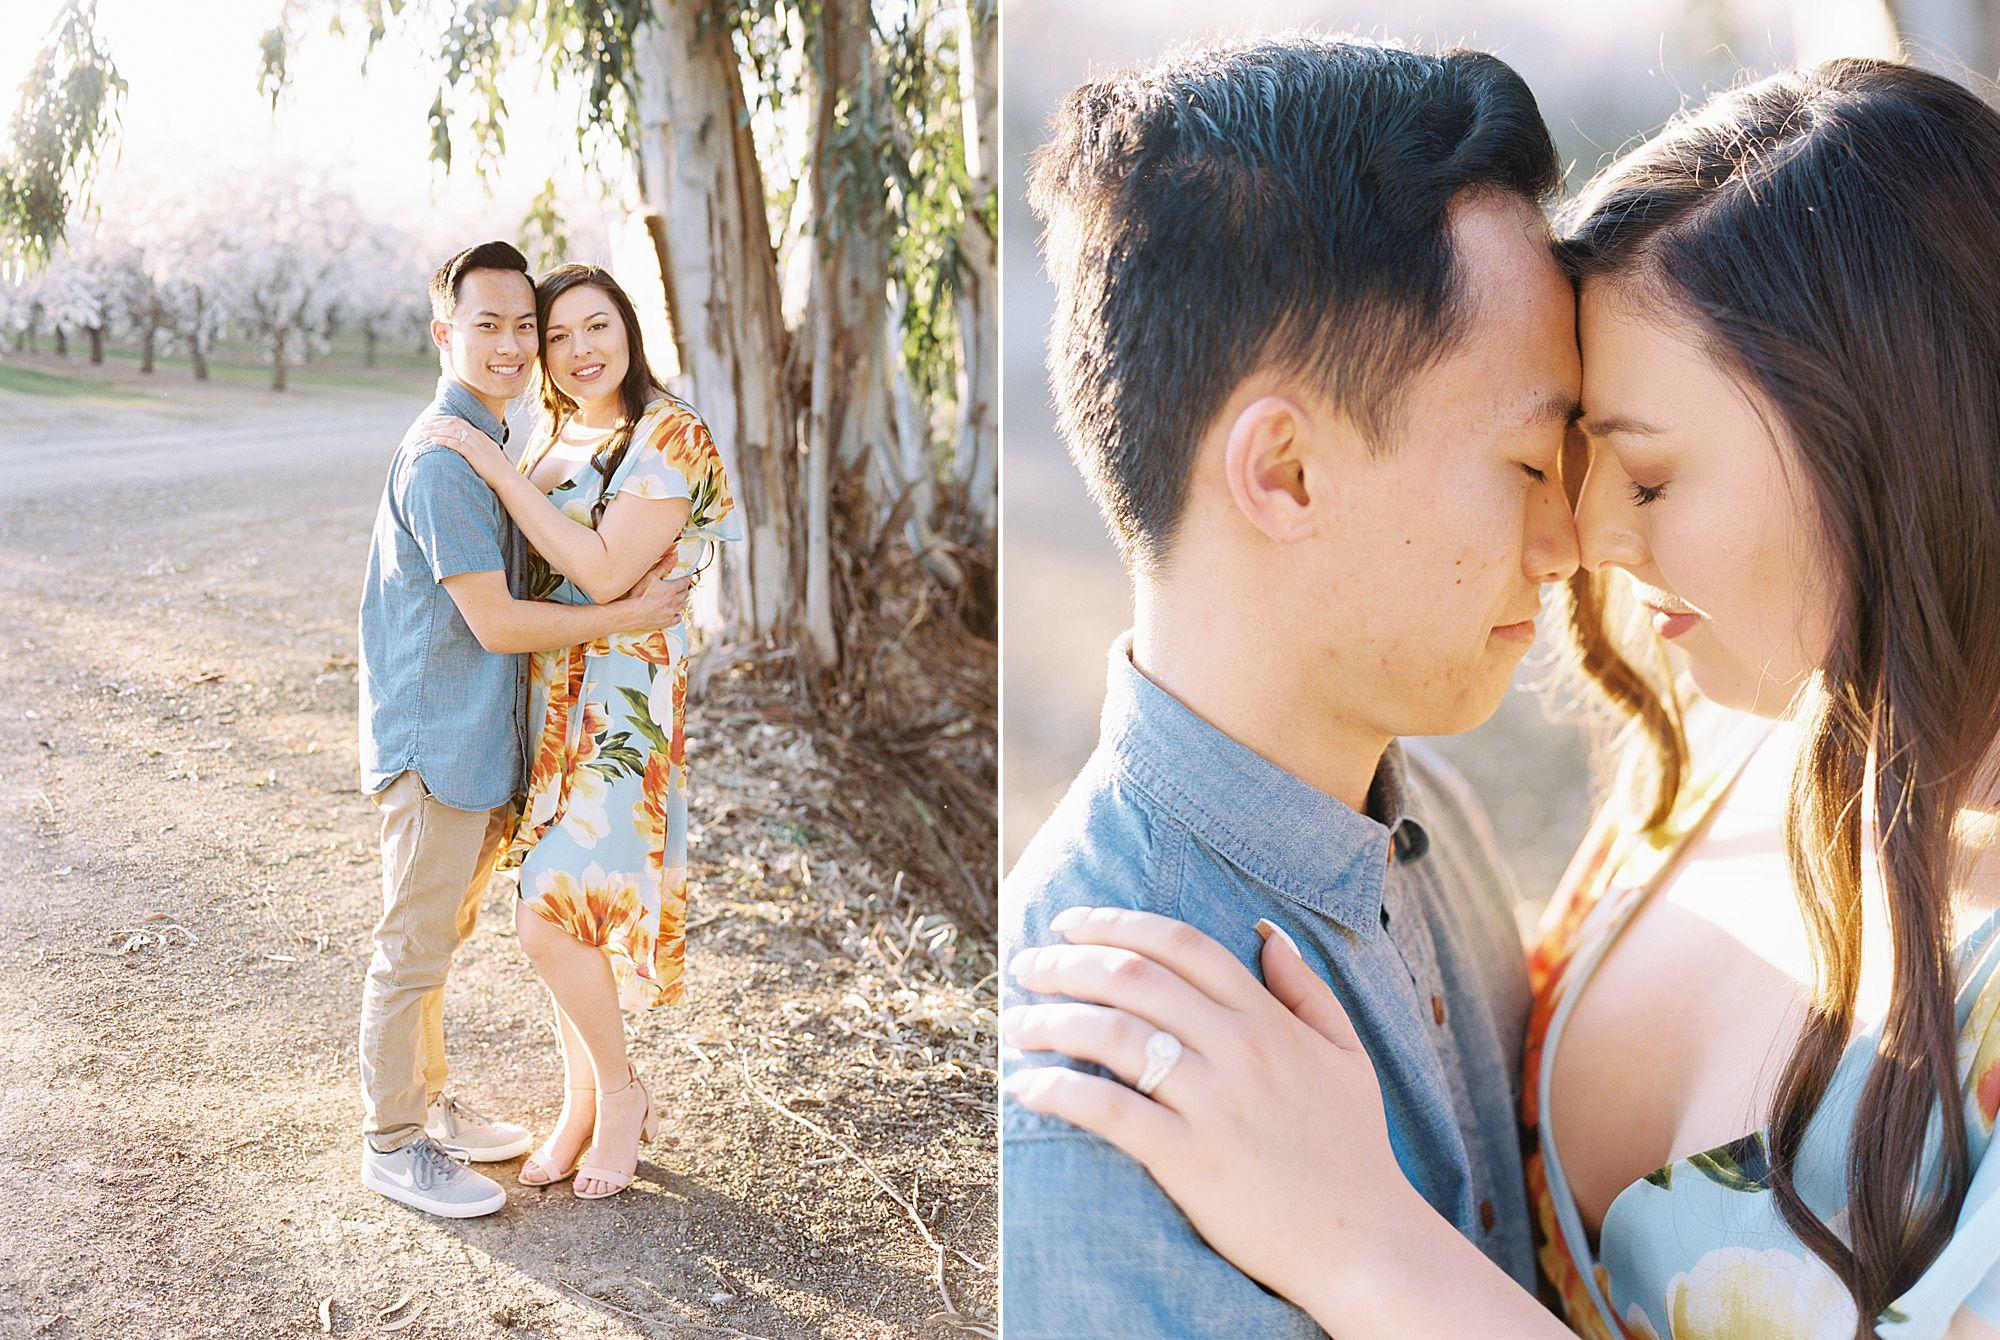 Almond Orchard Engagement Session - Caley and Tyler - Lone Oak Wedding - Ashley Baumgartner - Almond Blossom_0017.jpg